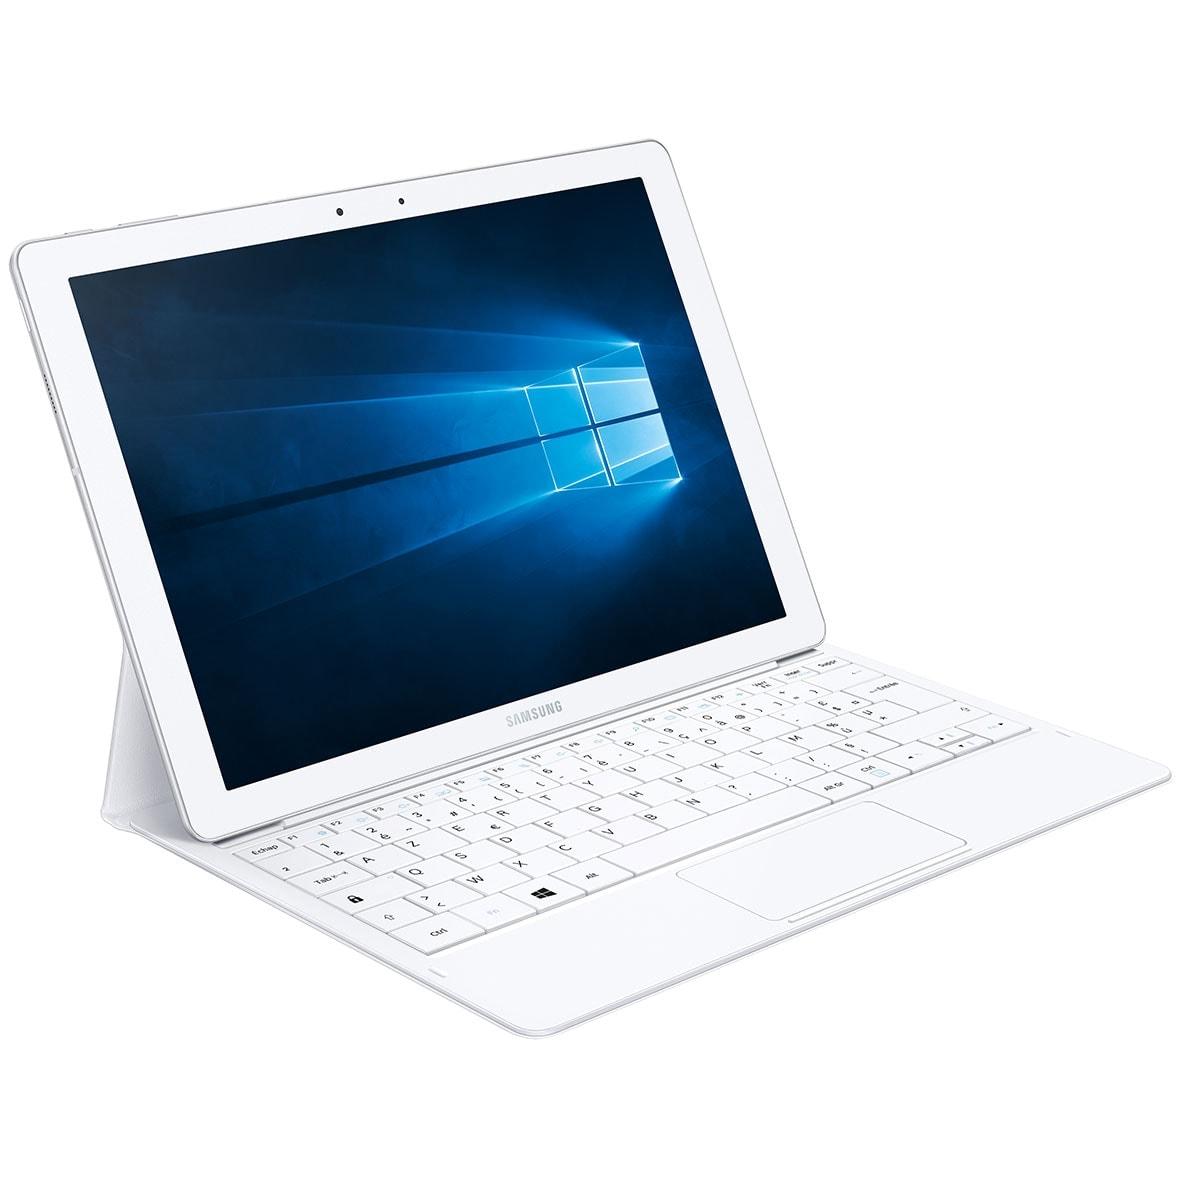 "Samsung Galaxy TabPro S W700 WH -M3-6Y30/4Go/128Go/12""/10 (SM-W700NZWAXEF) - Achat / Vente PC Portable sur Cybertek.fr - 0"